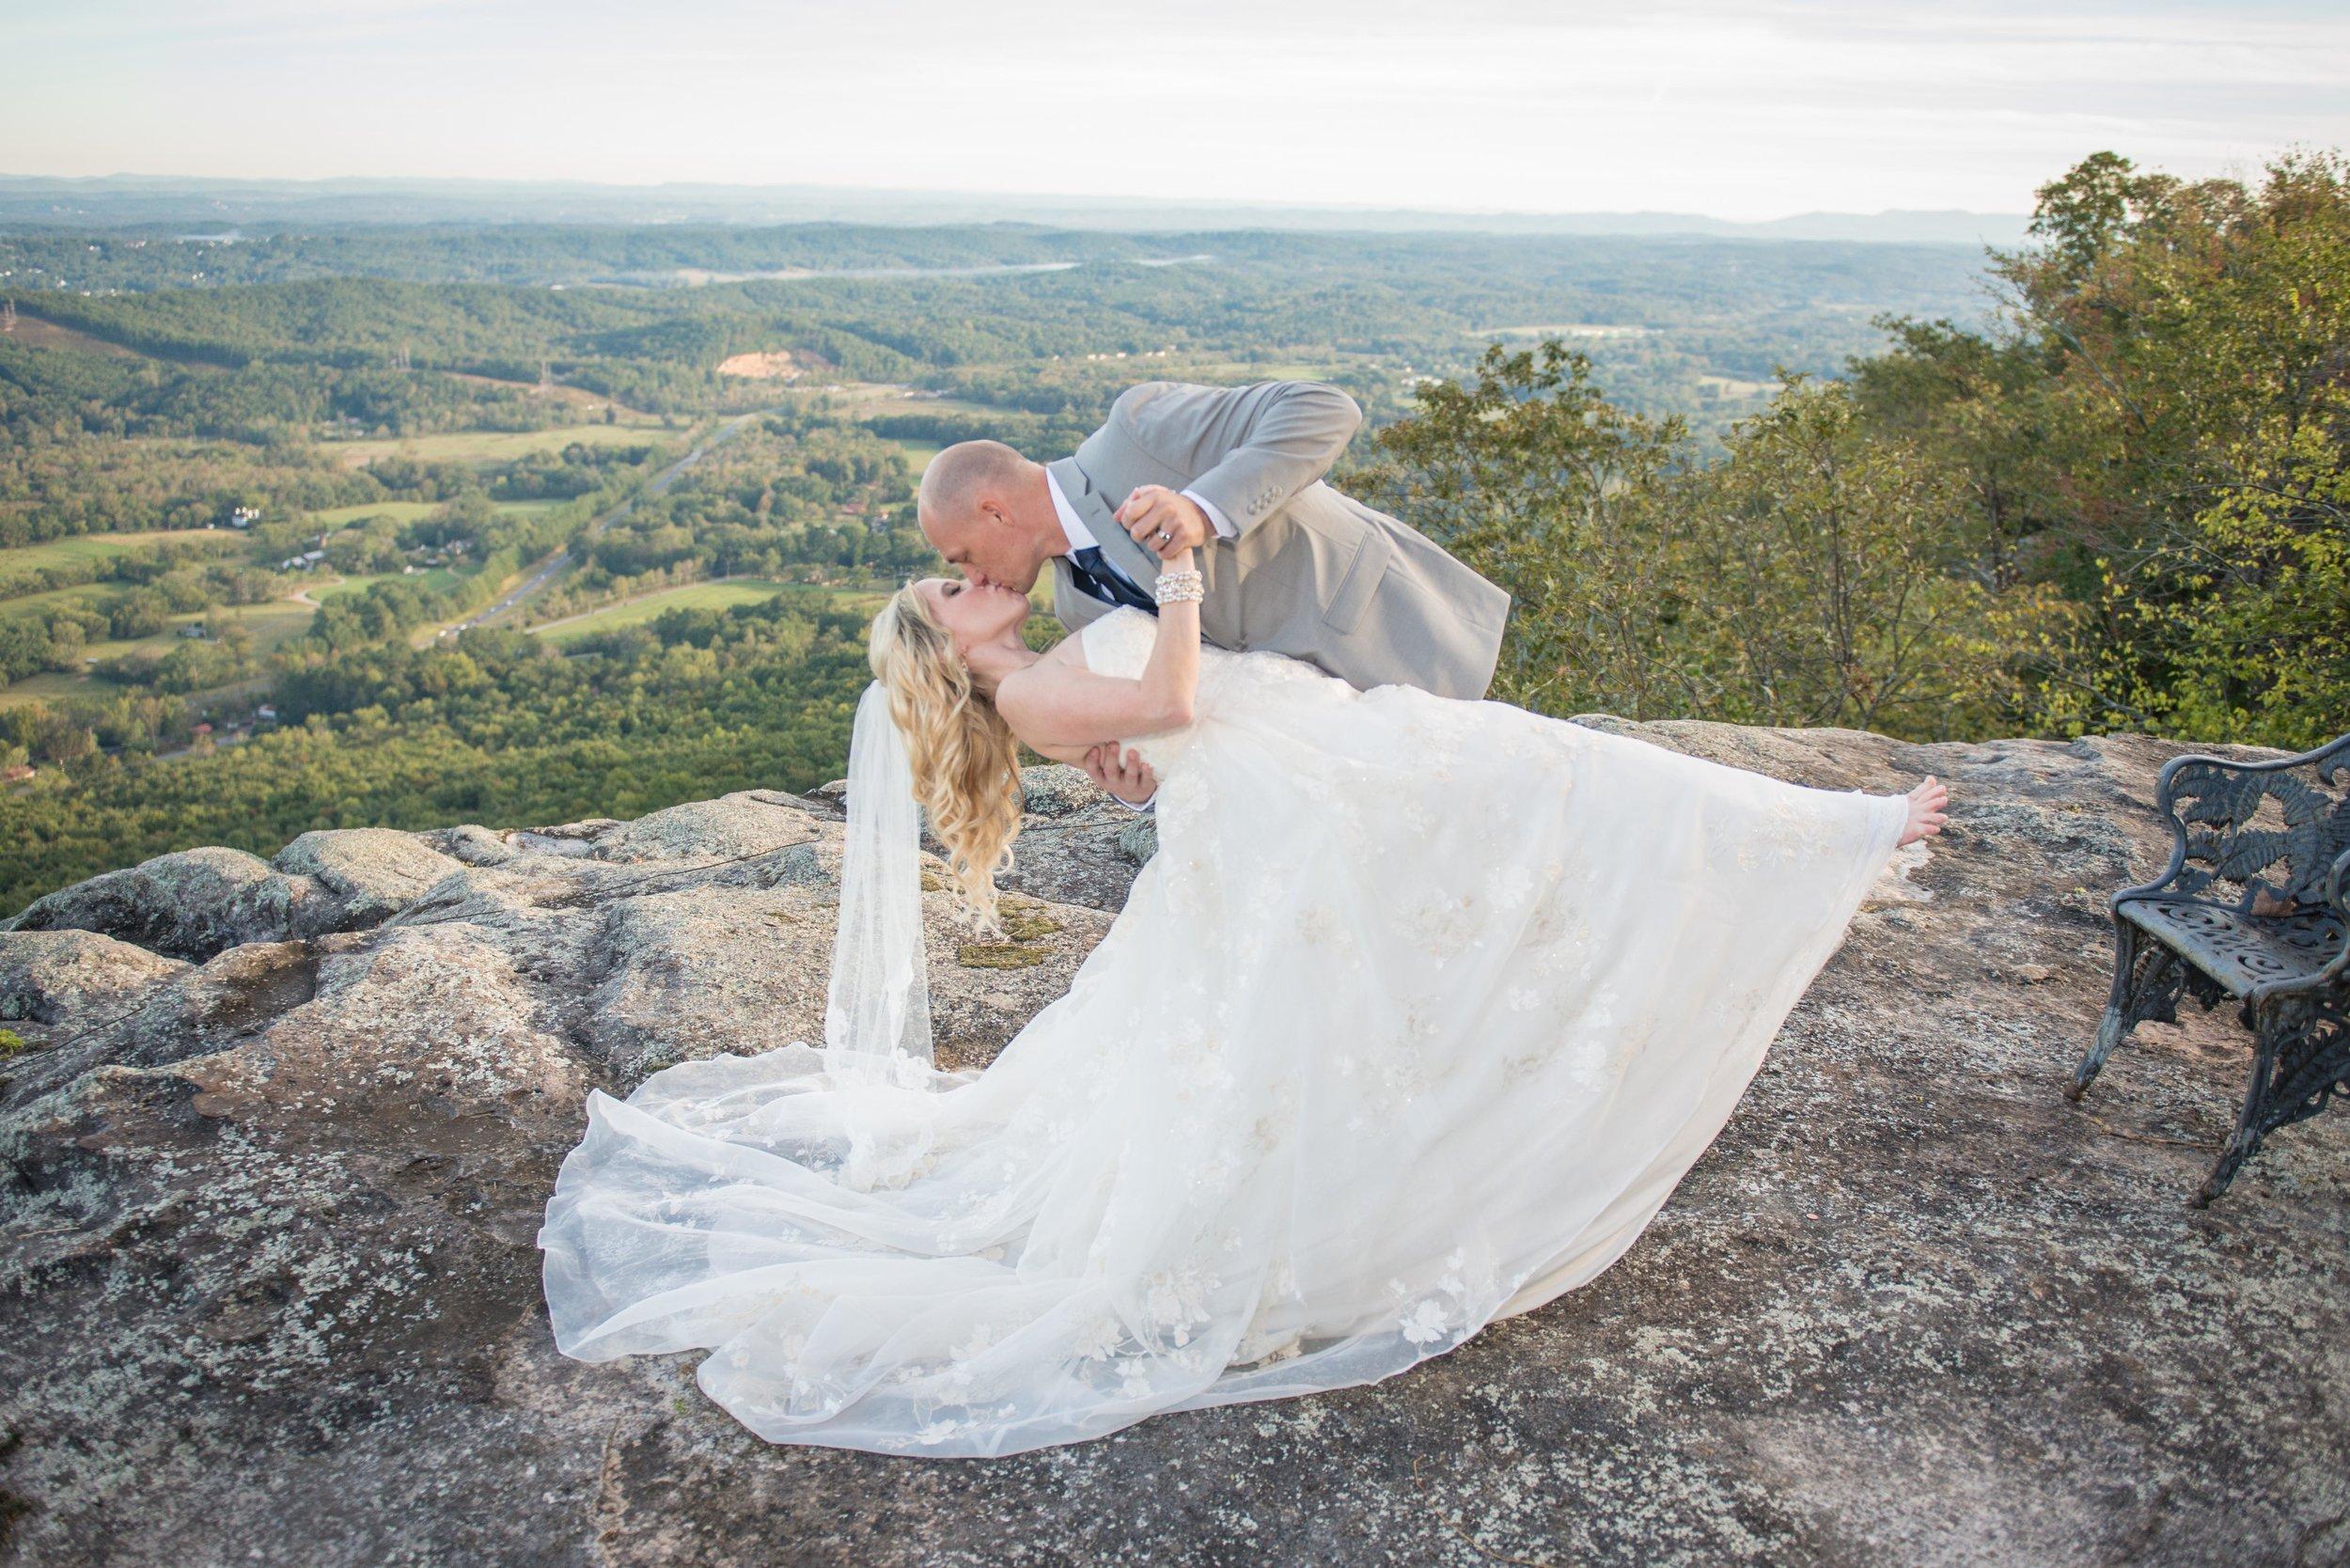 00001_Kuhnert-Wedding-83.jpg